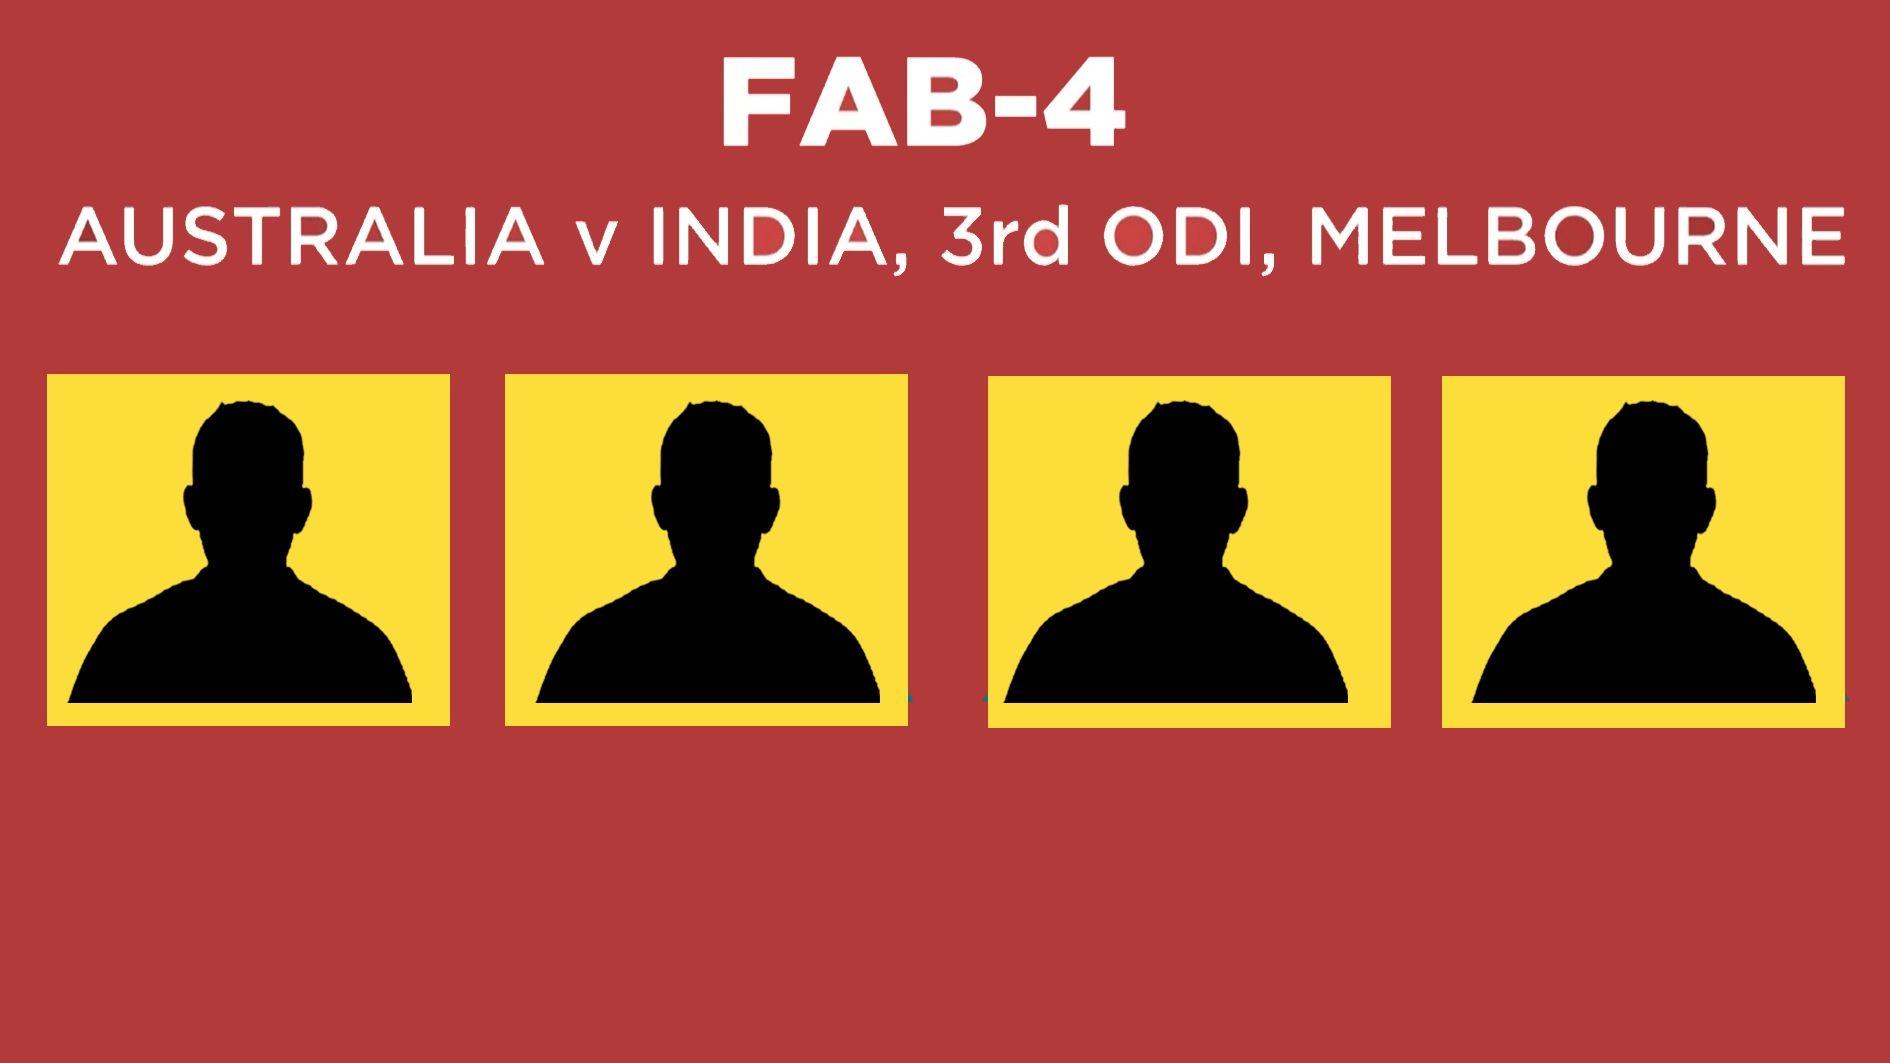 India tour of Australia 2018/19 - Live Cricket Scores, Match ...